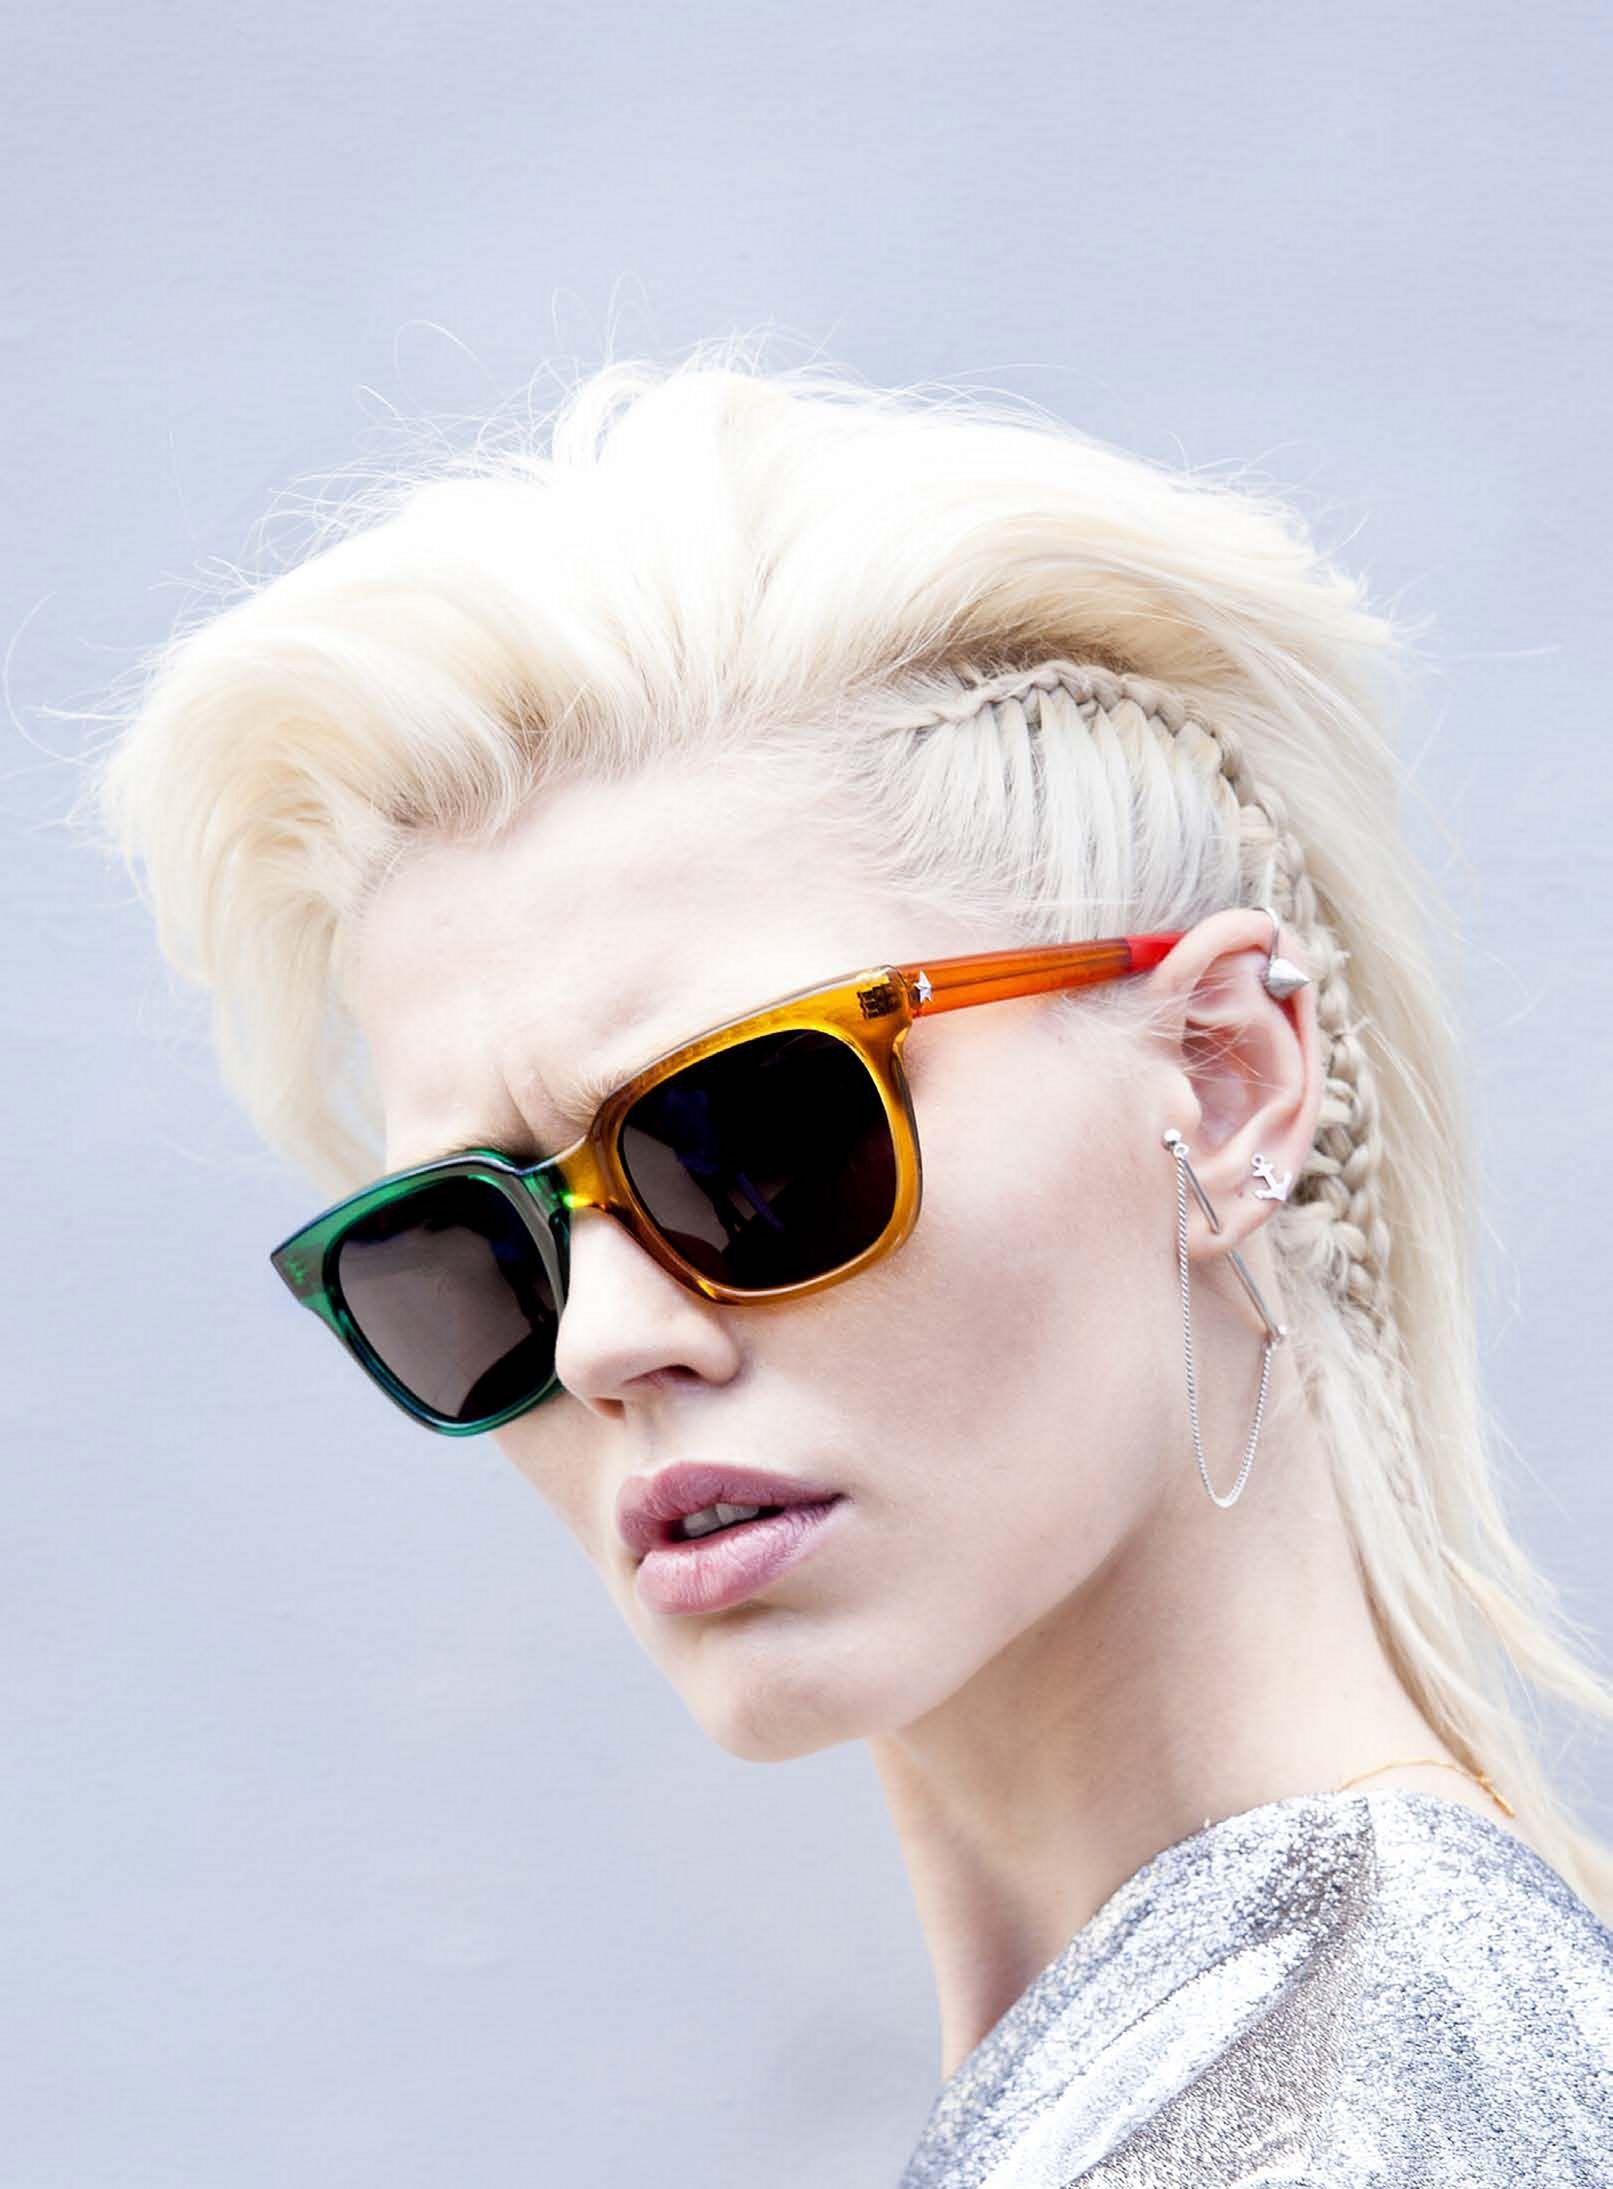 25 Top Sunglasses Fashion Ideas for Women